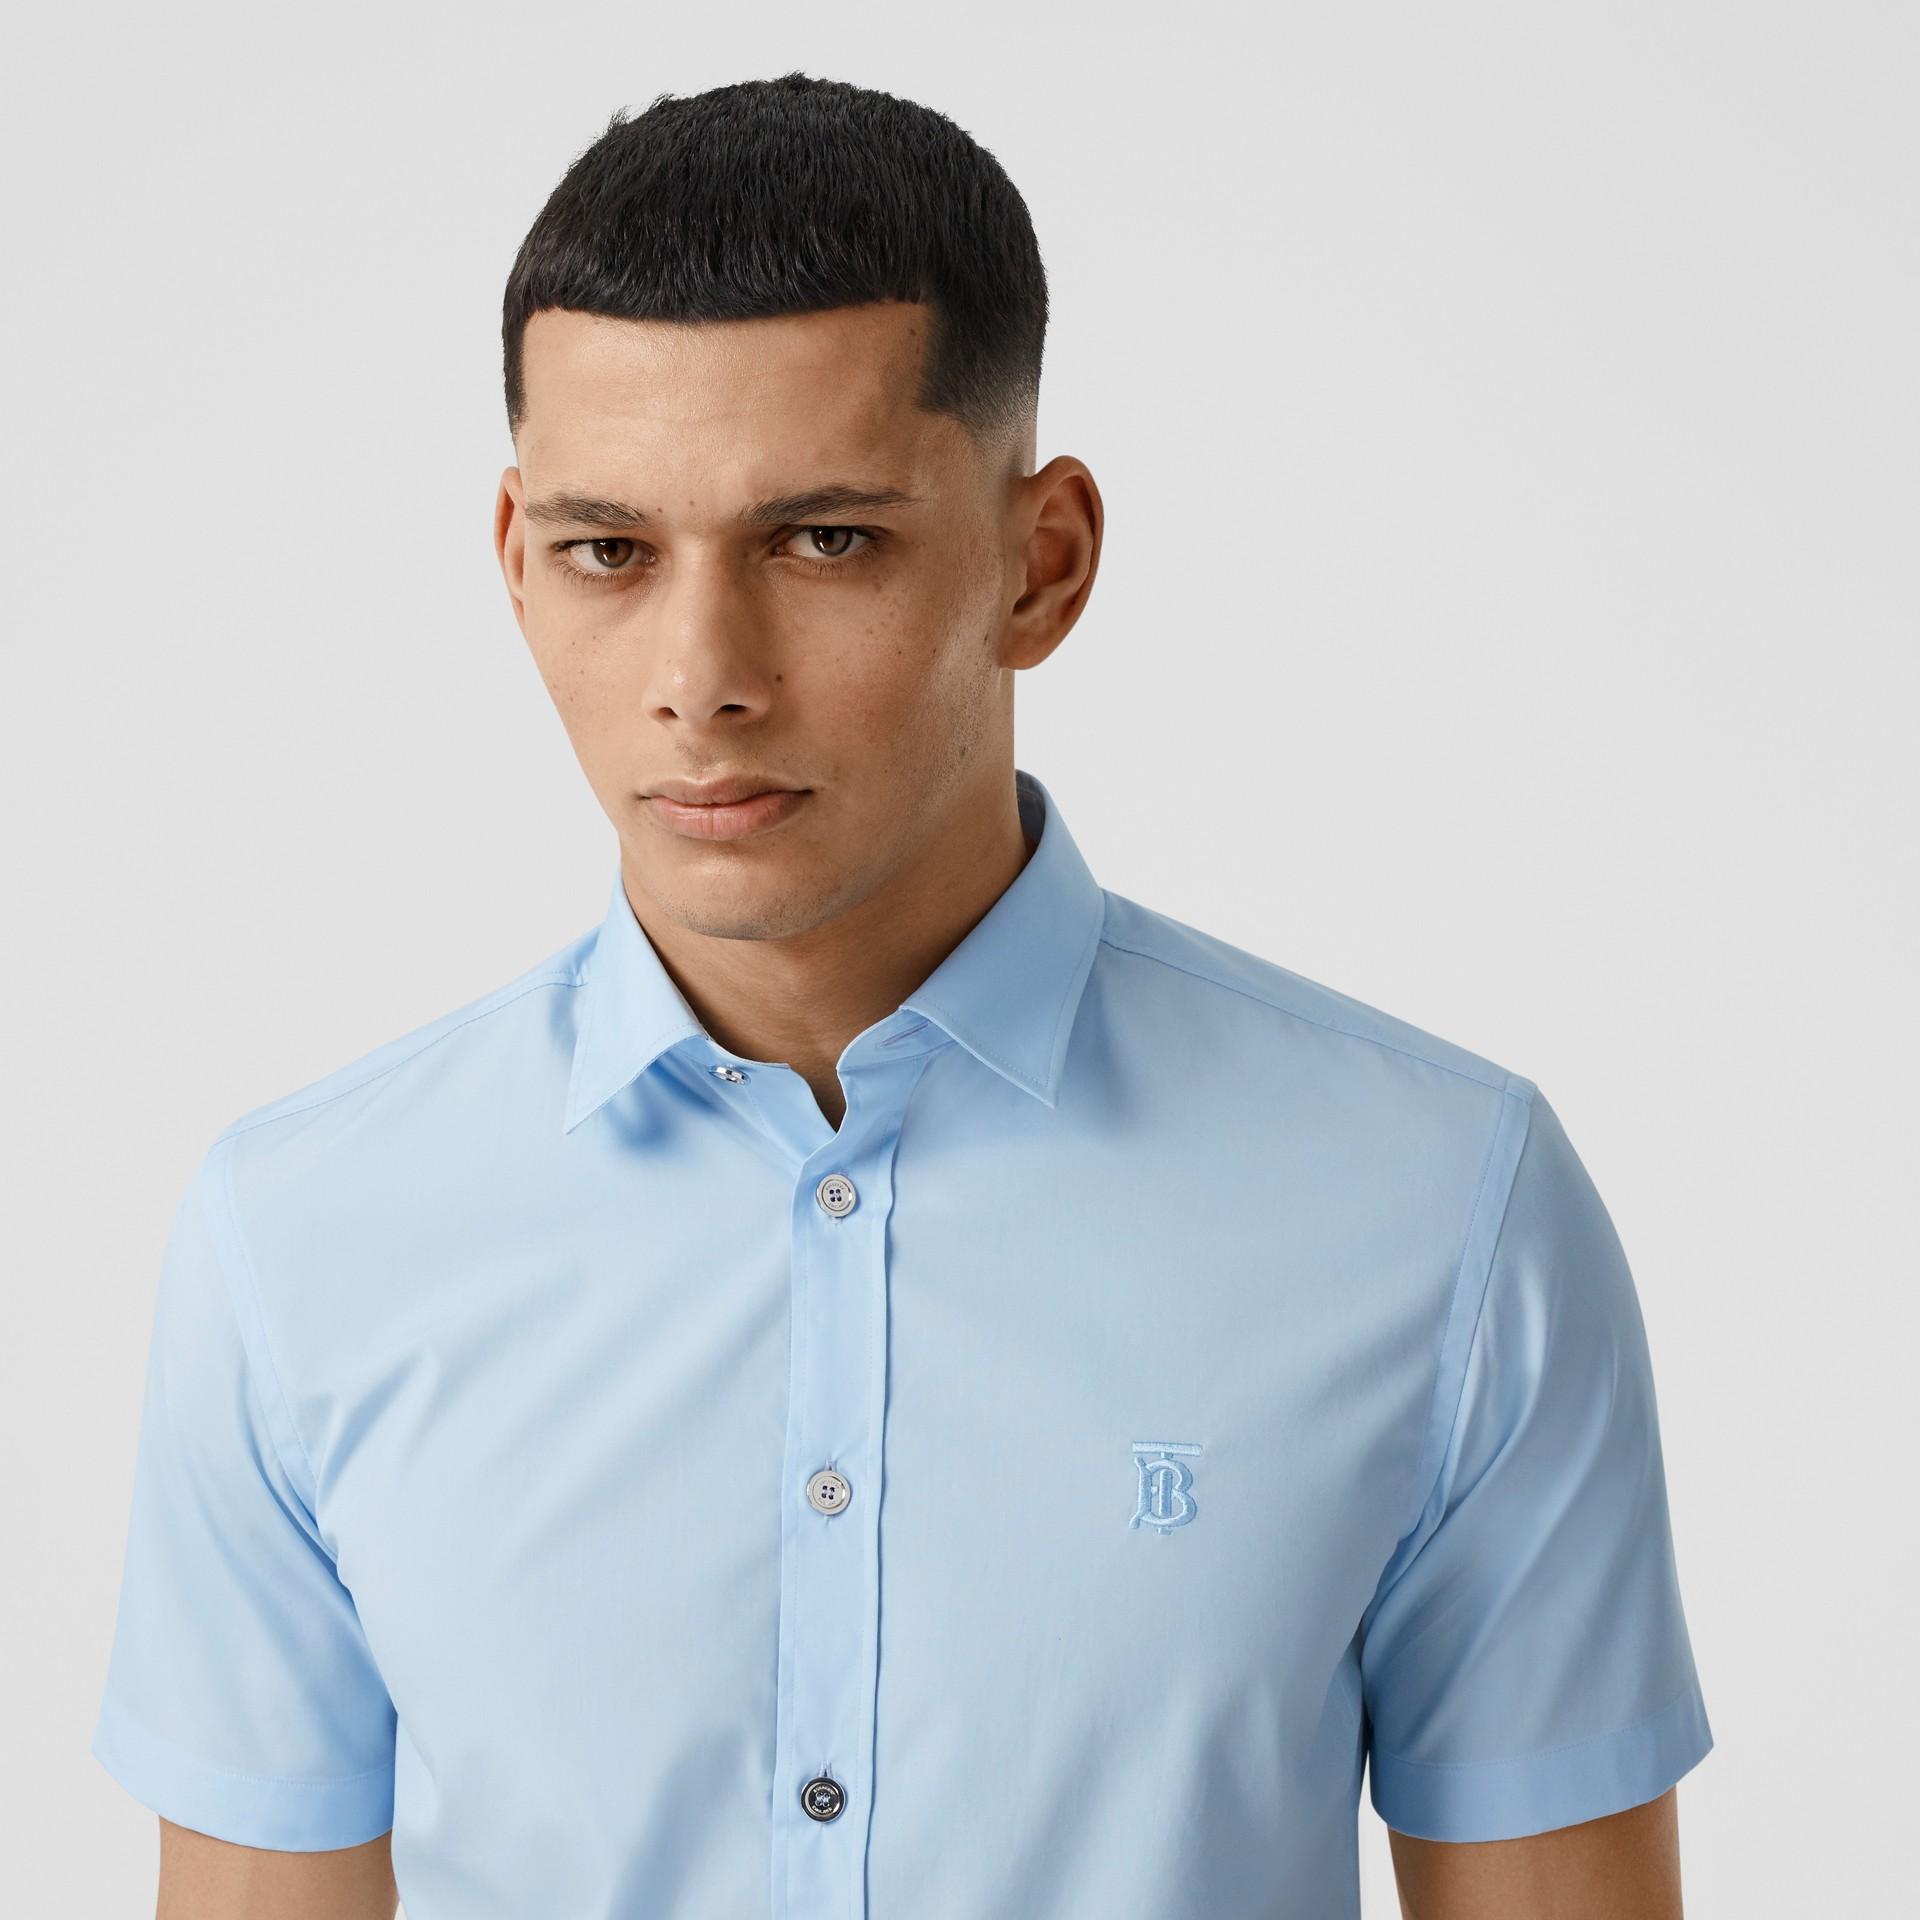 Short-sleeve Monogram Motif Stretch Cotton Shirt in Pale Blue - Men | Burberry United Kingdom - gallery image 1